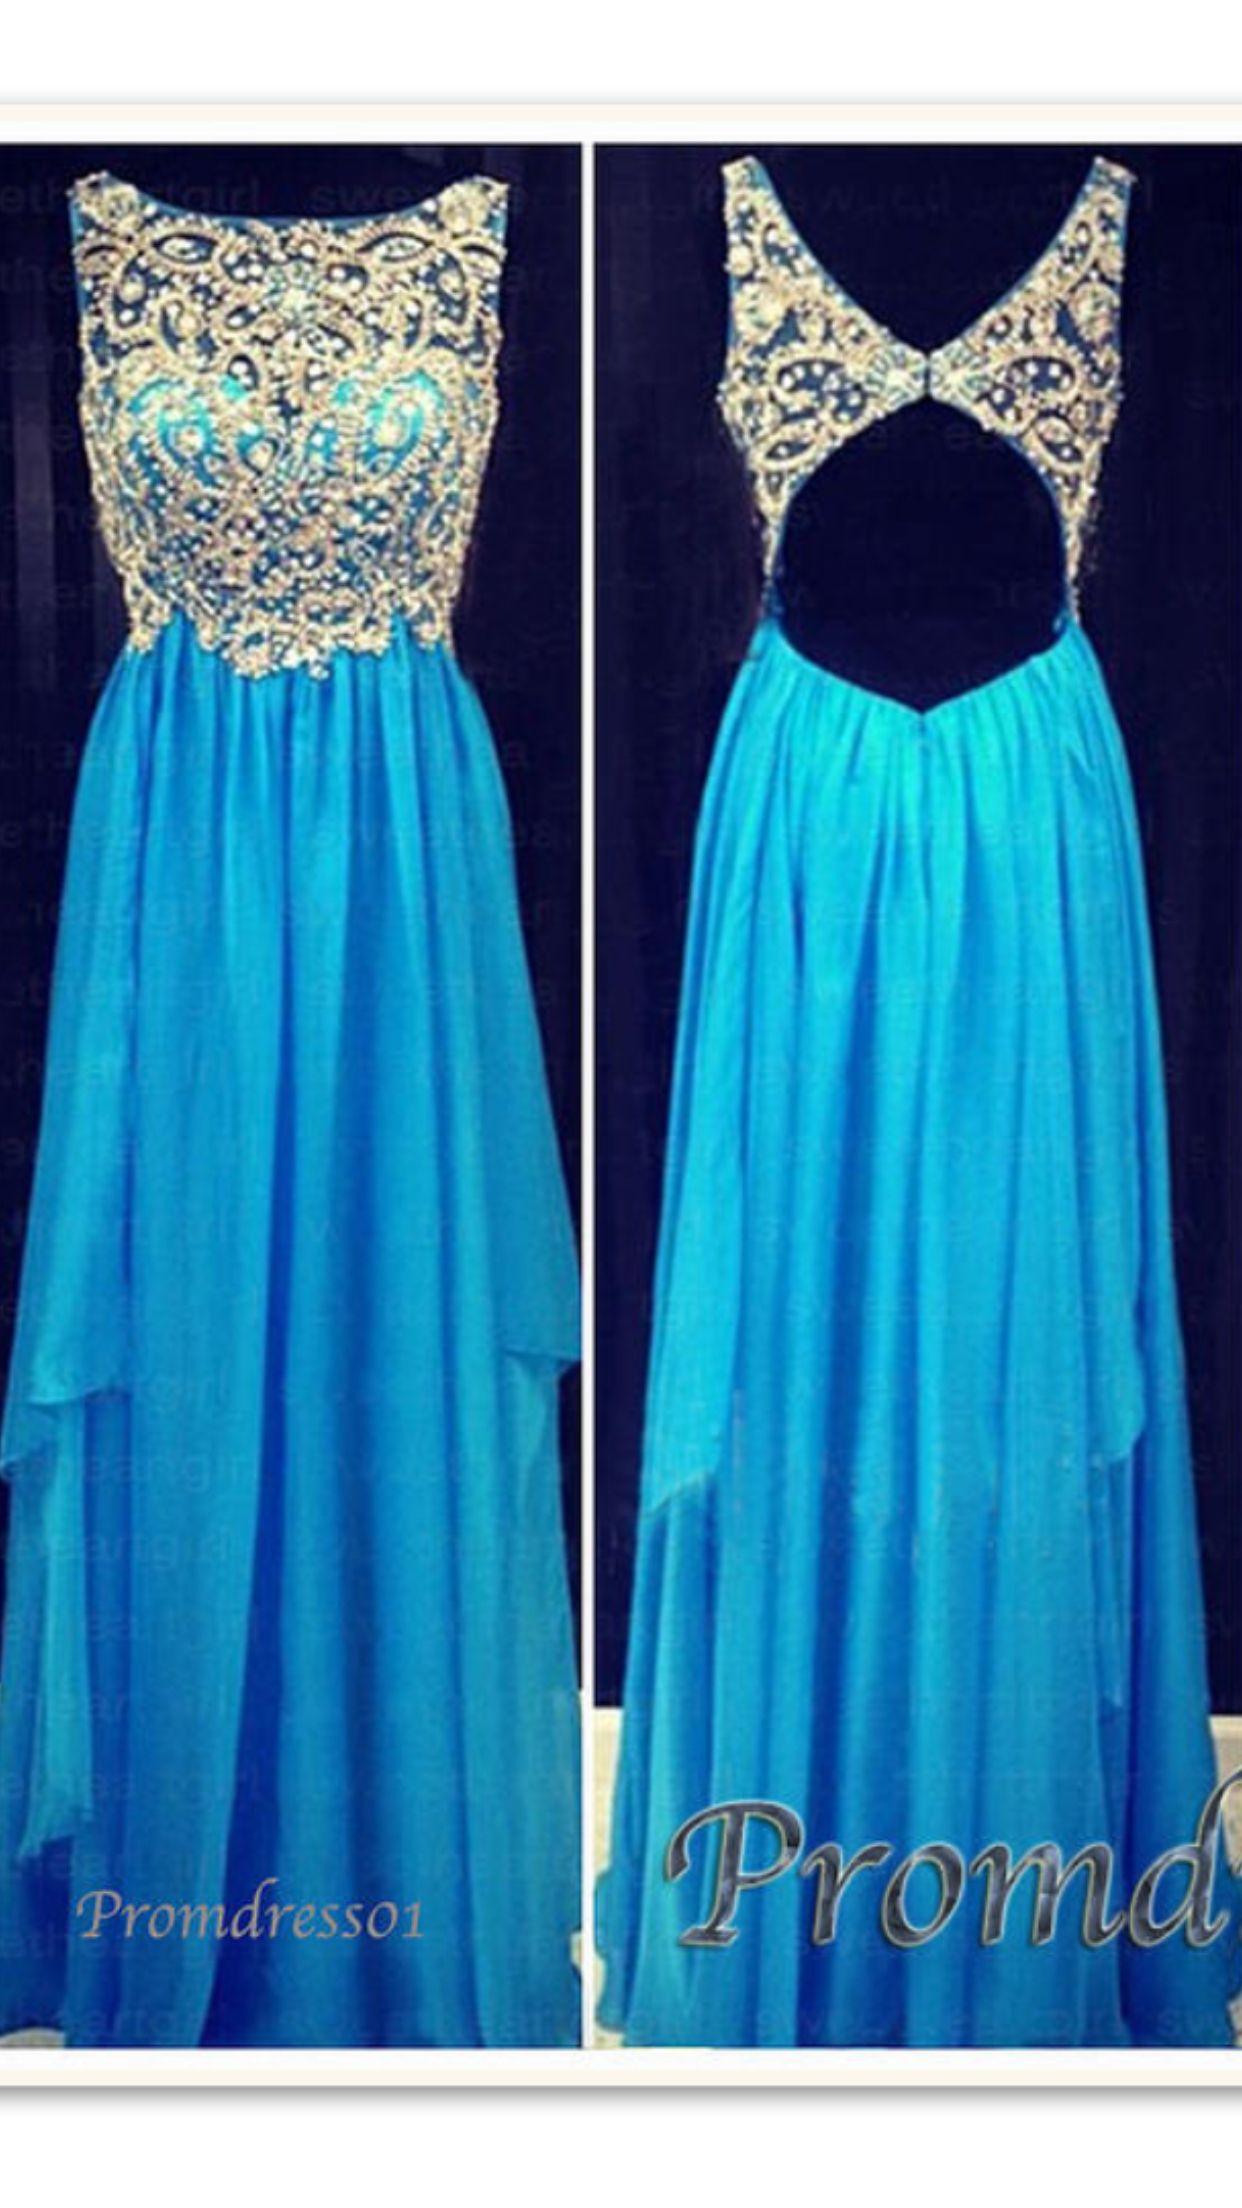 Blue sequin prom dress | Prom/Sadies | Pinterest | Sequin prom ...